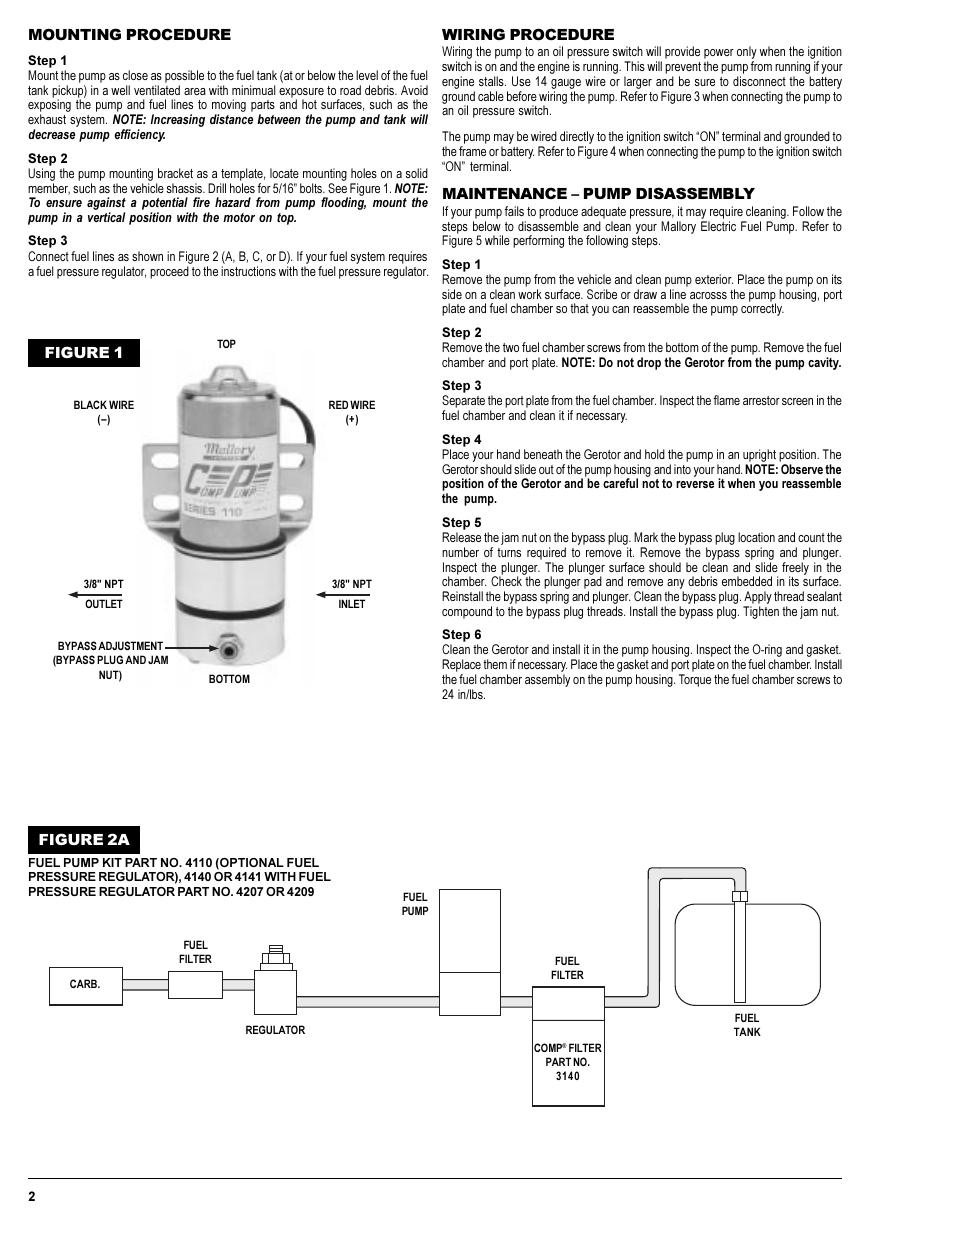 Mallory Fuel Pump Wiring Diagram - 67 Chevy 2 Column Wiring Schematic -  Stereoa.yenpancane.jeanjaures37.fr